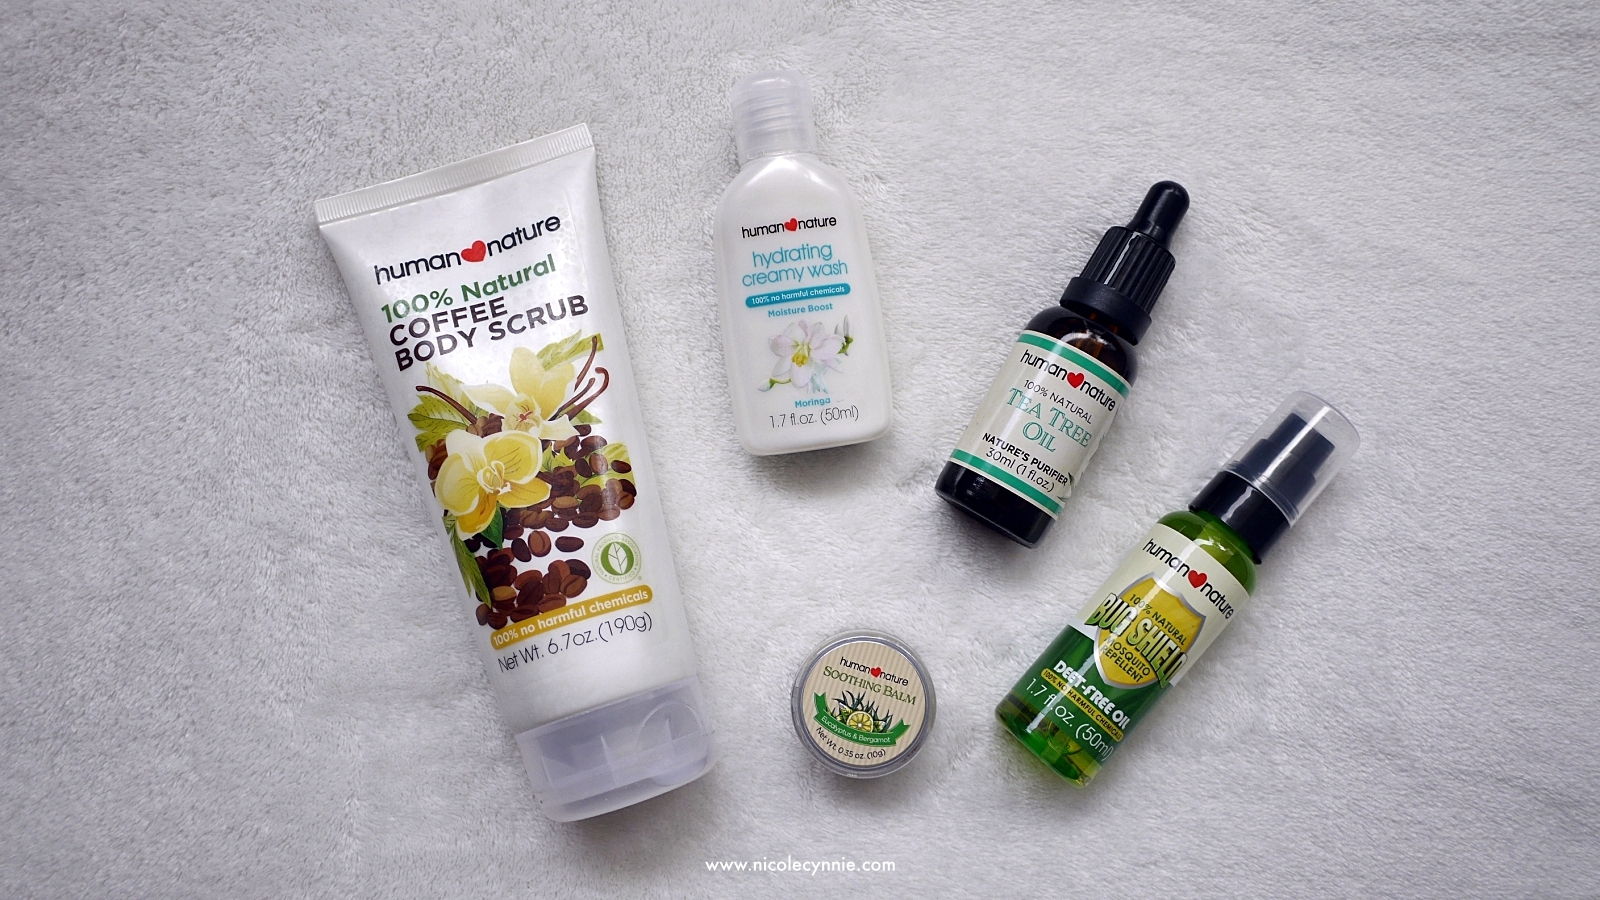 Nicole Cynnie | Human Nature 100% Natural Coffee Body Scrub 03